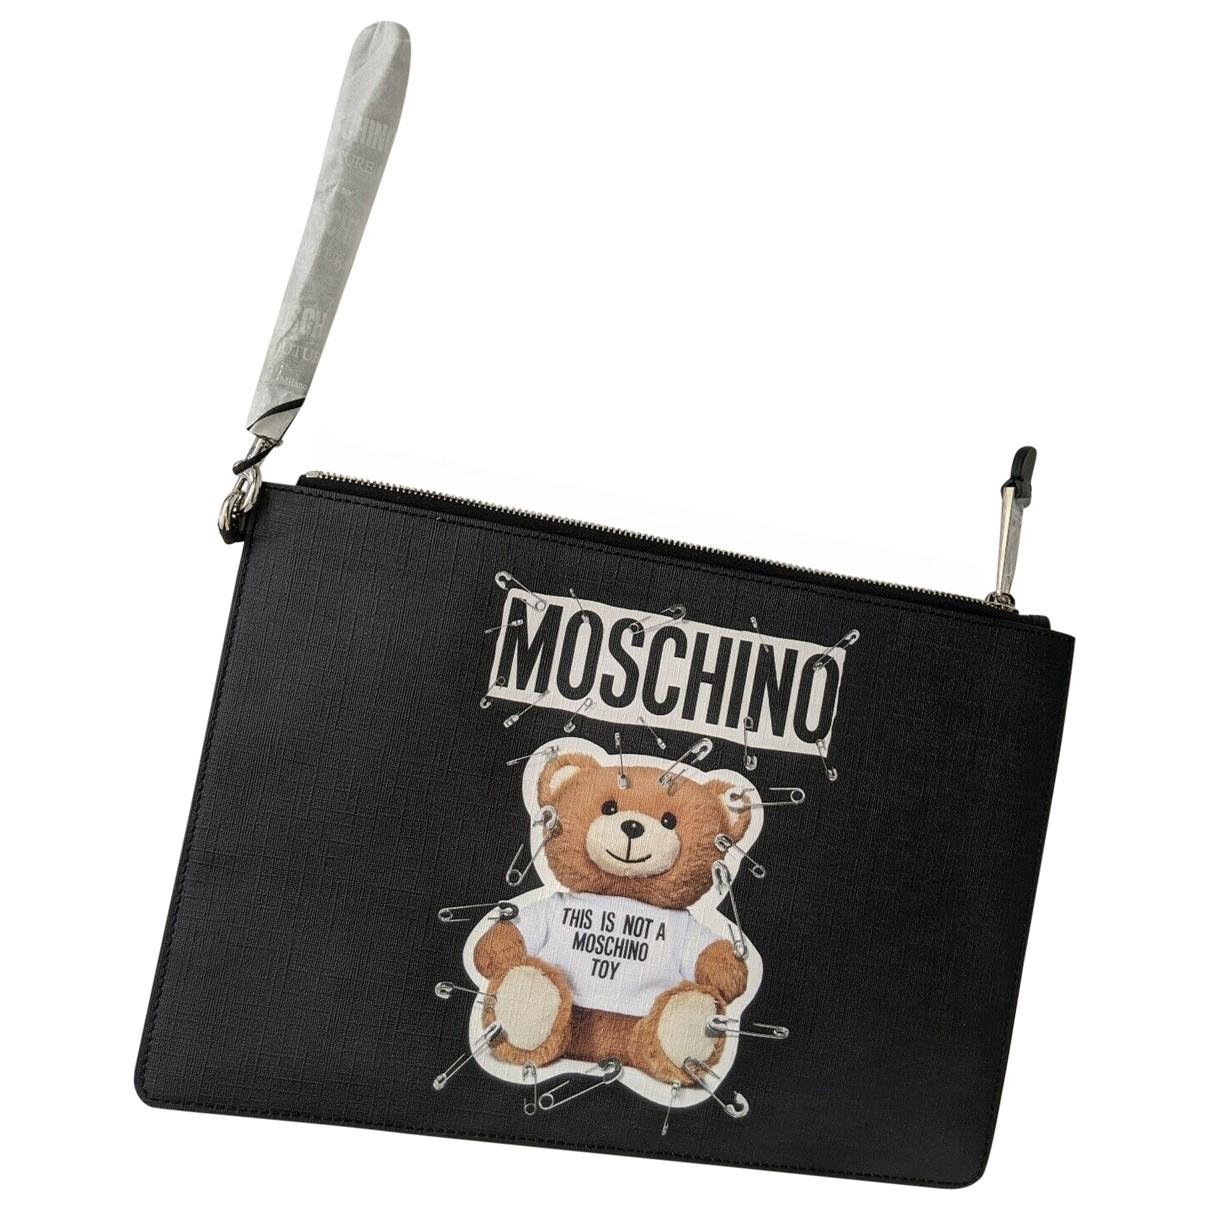 Moschino \N Black Leather Clutch bag for Women \N